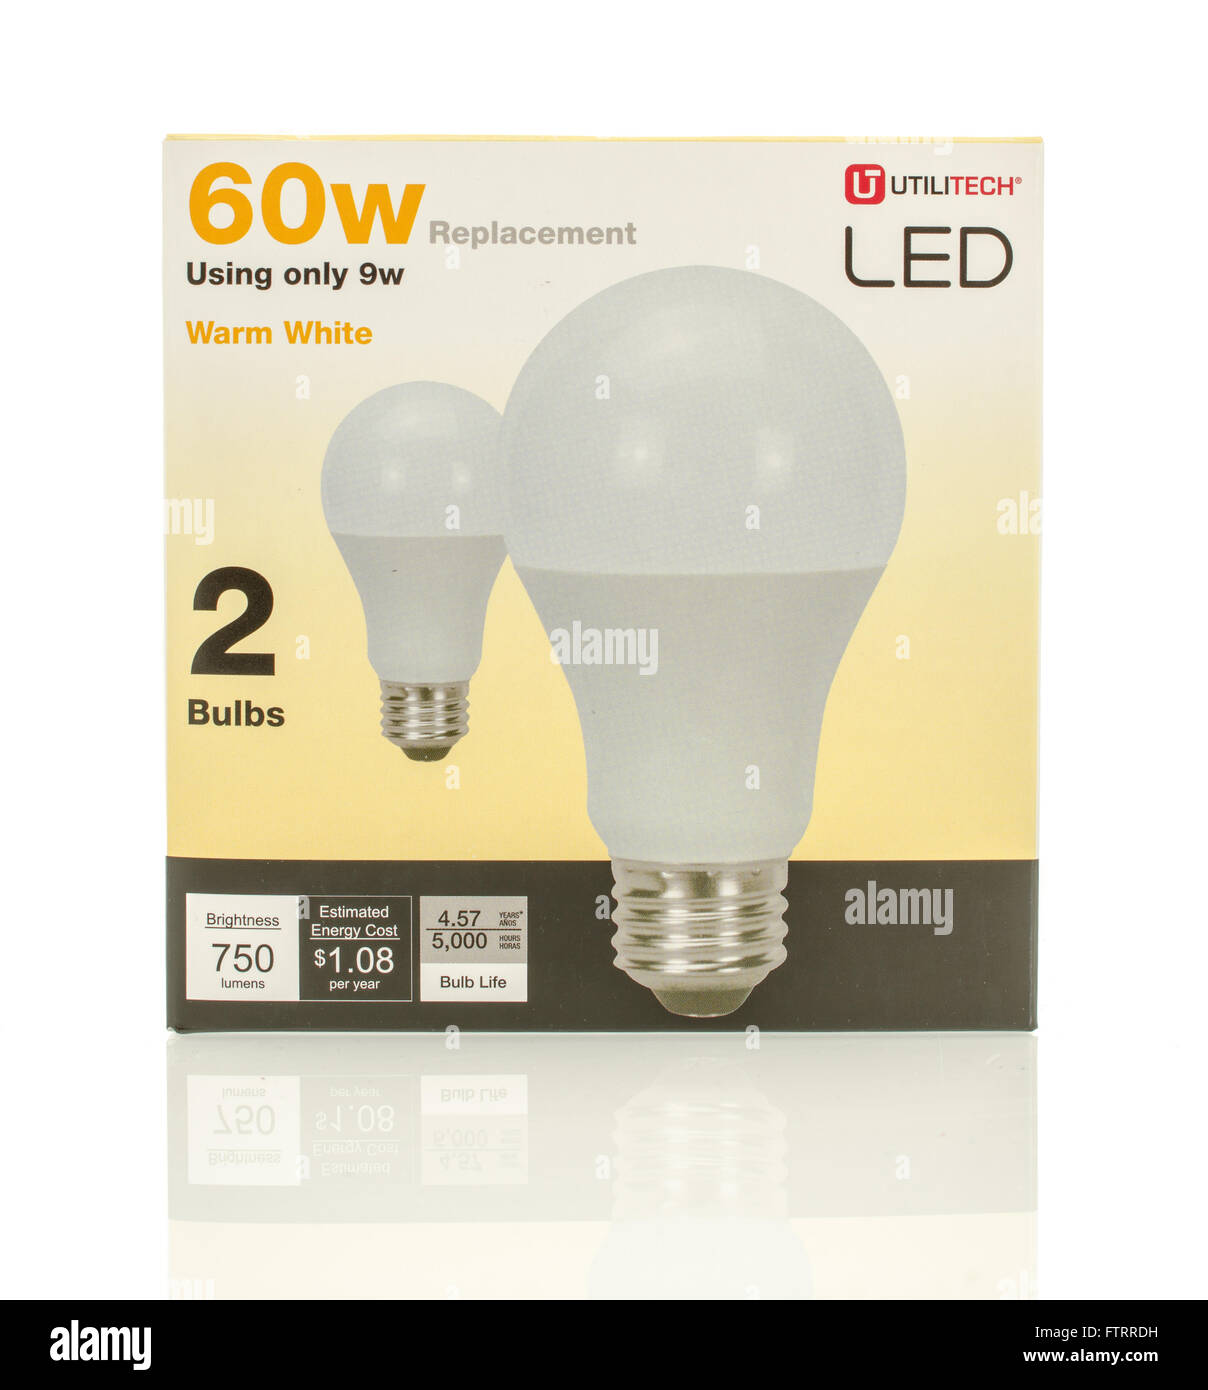 Winneconne, WI - 29 March 2016:  A box of 60w LED lightbulbs made by Ulititech. - Stock Image